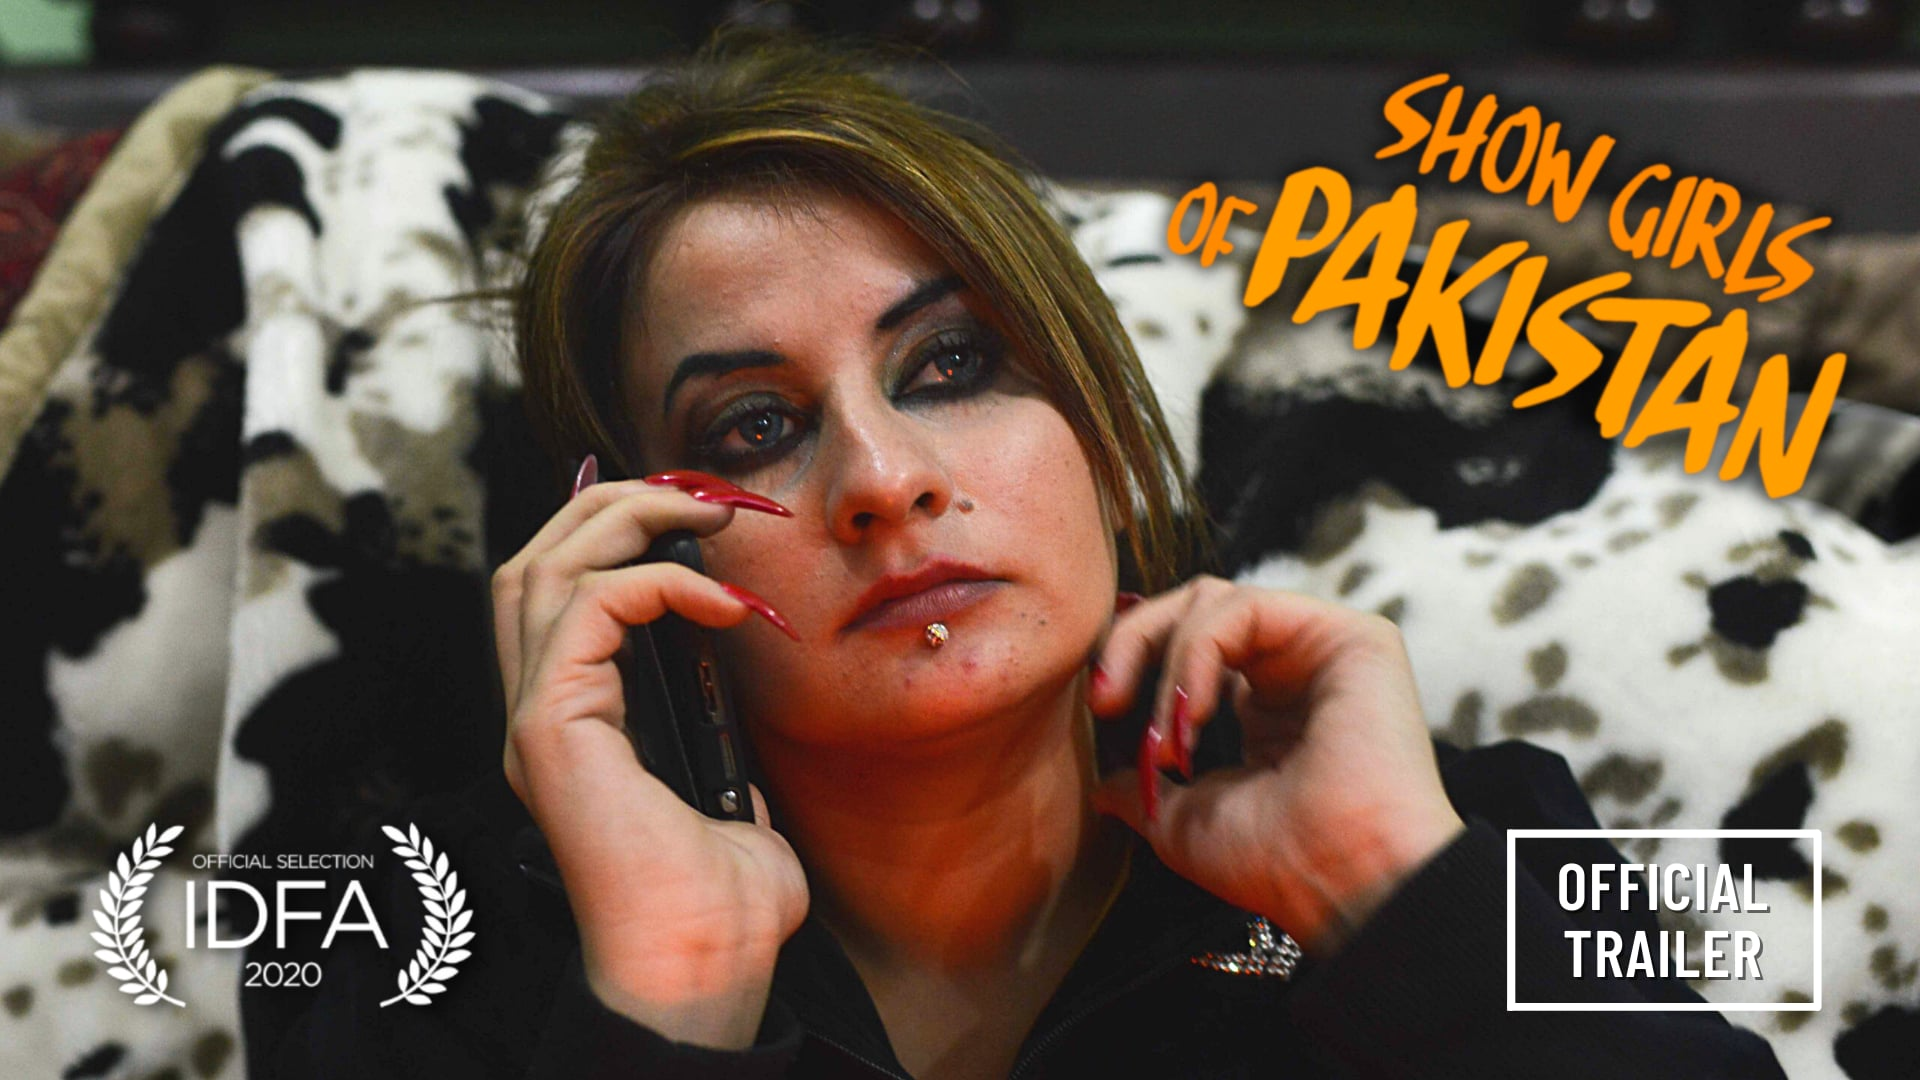 Showgirls of Pakistan   Official Trailer